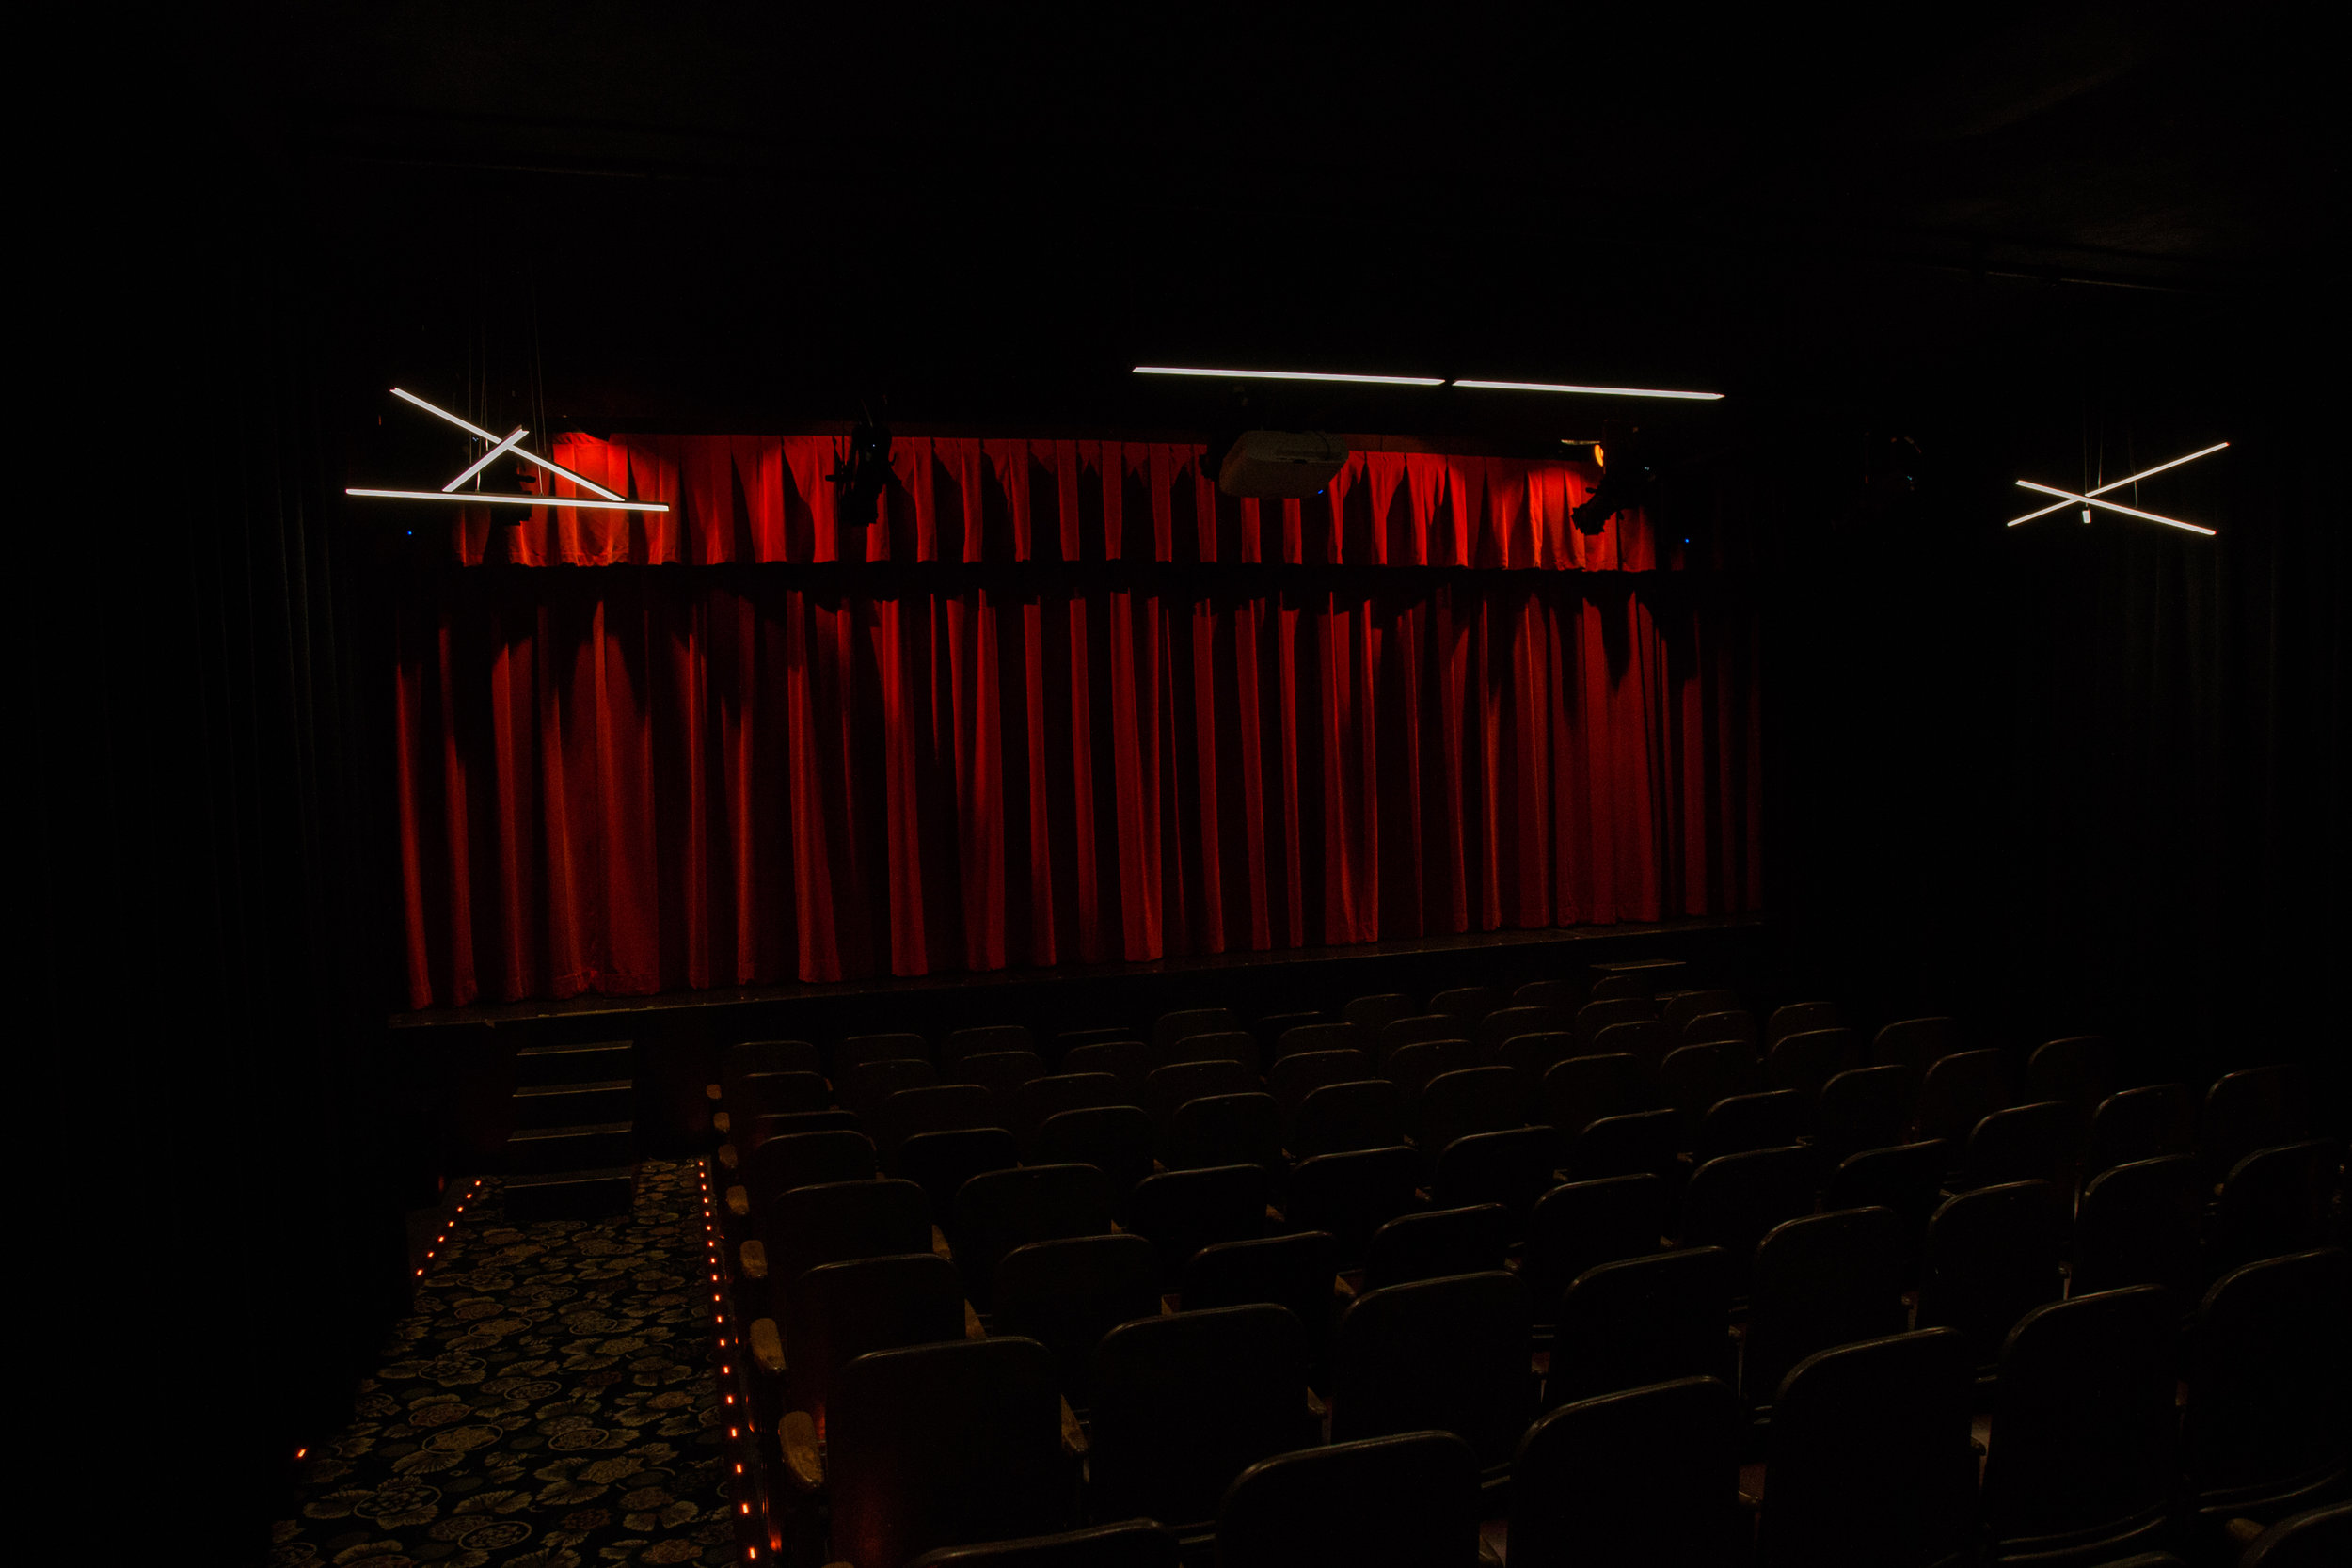 2018-01-19 Curtain 01.jpg